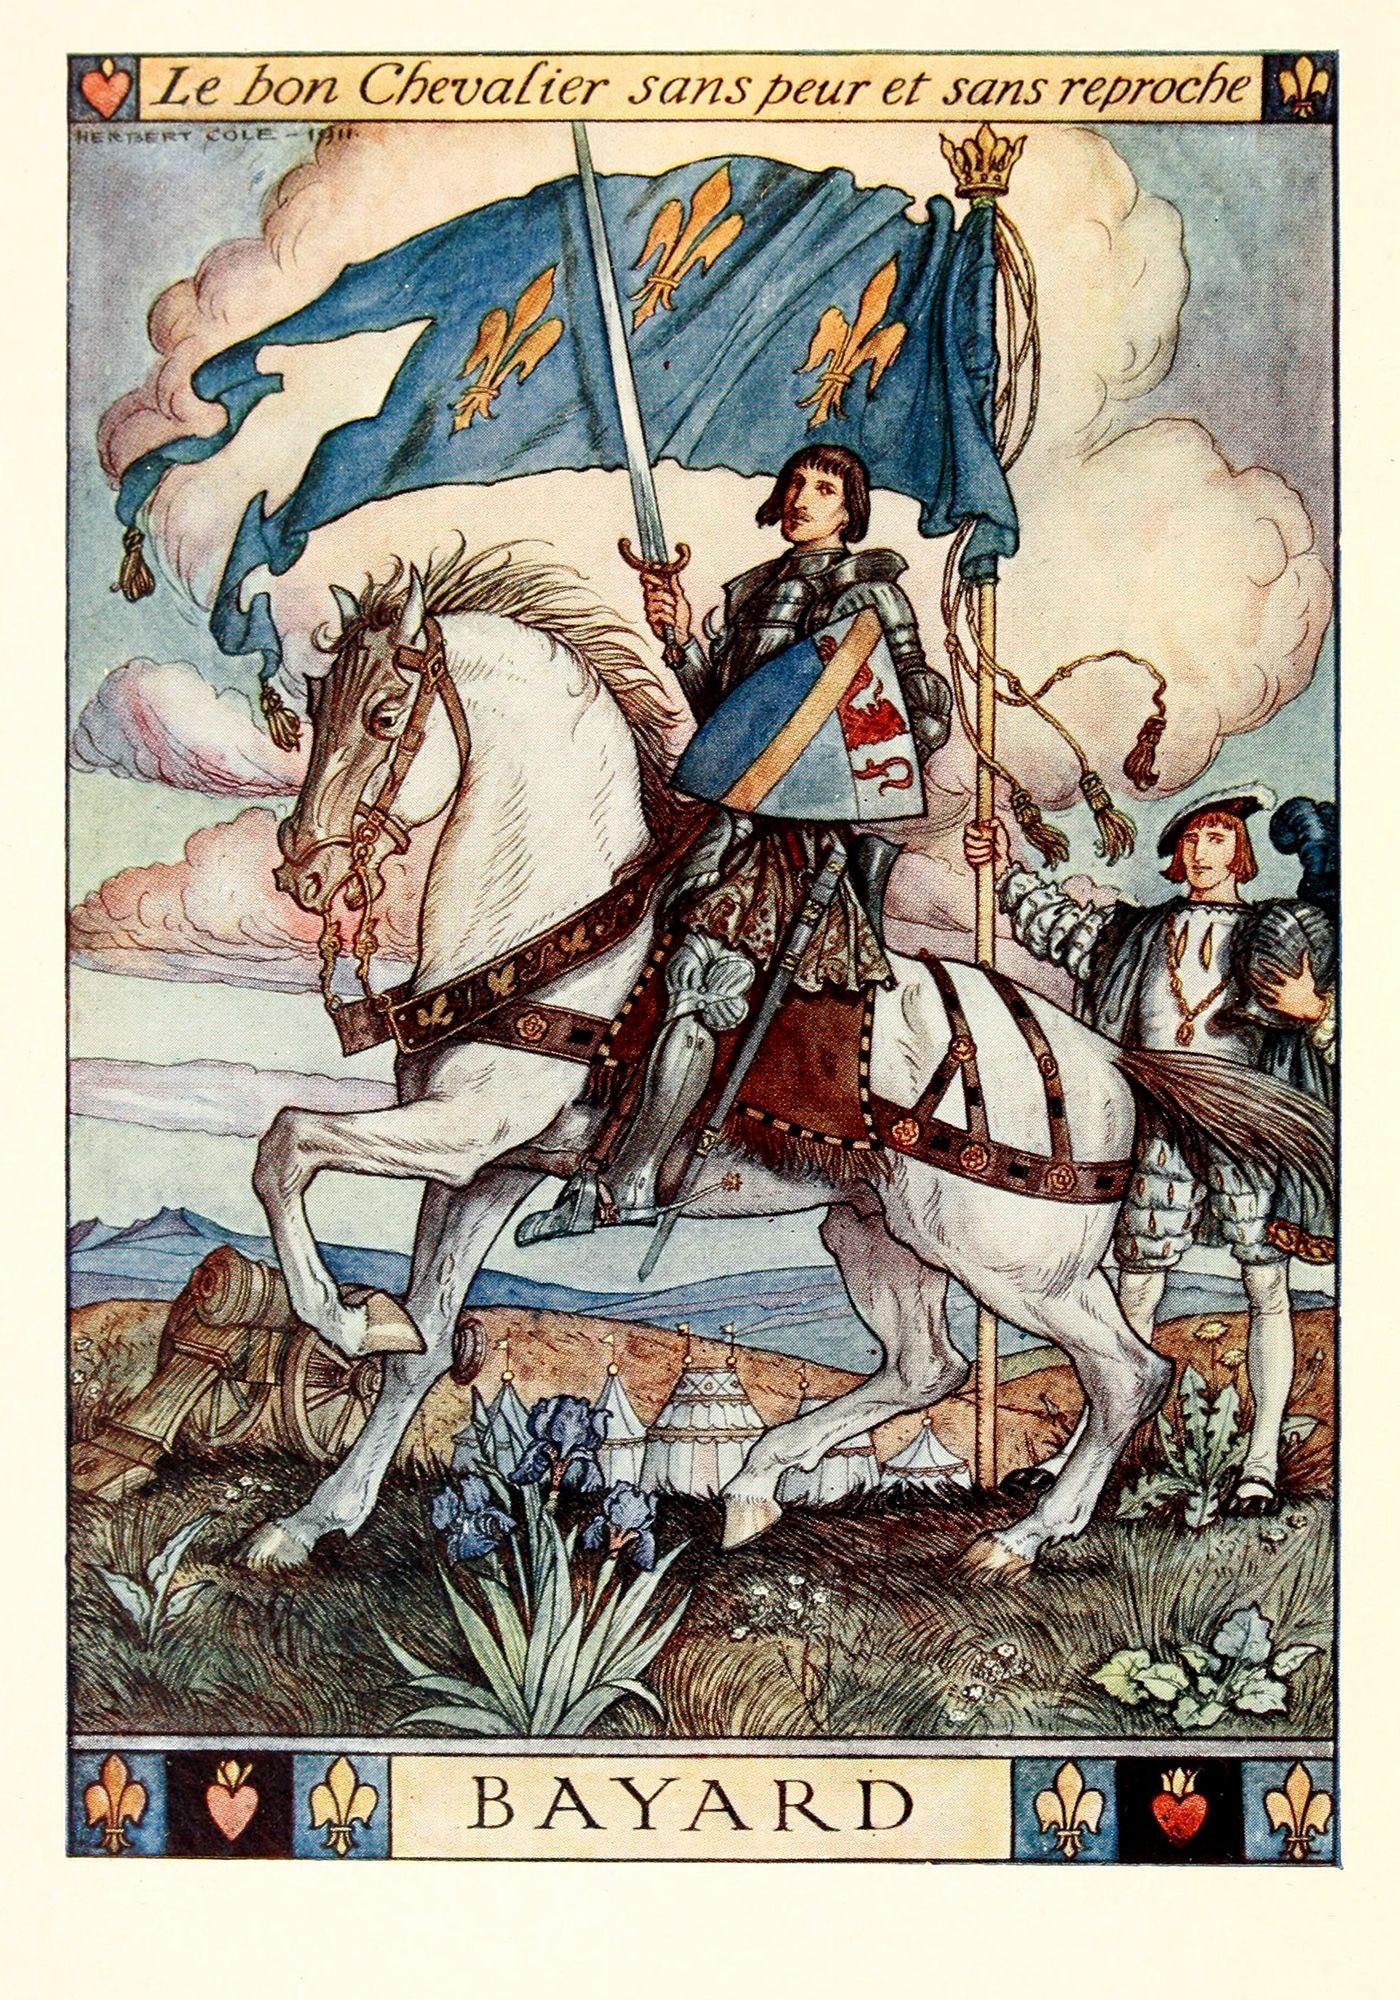 Sans Peur Et Sans Reproche : reproche, Herbert, Illustrations:, Story, Bayard, Knight,, Bayard,, Knight